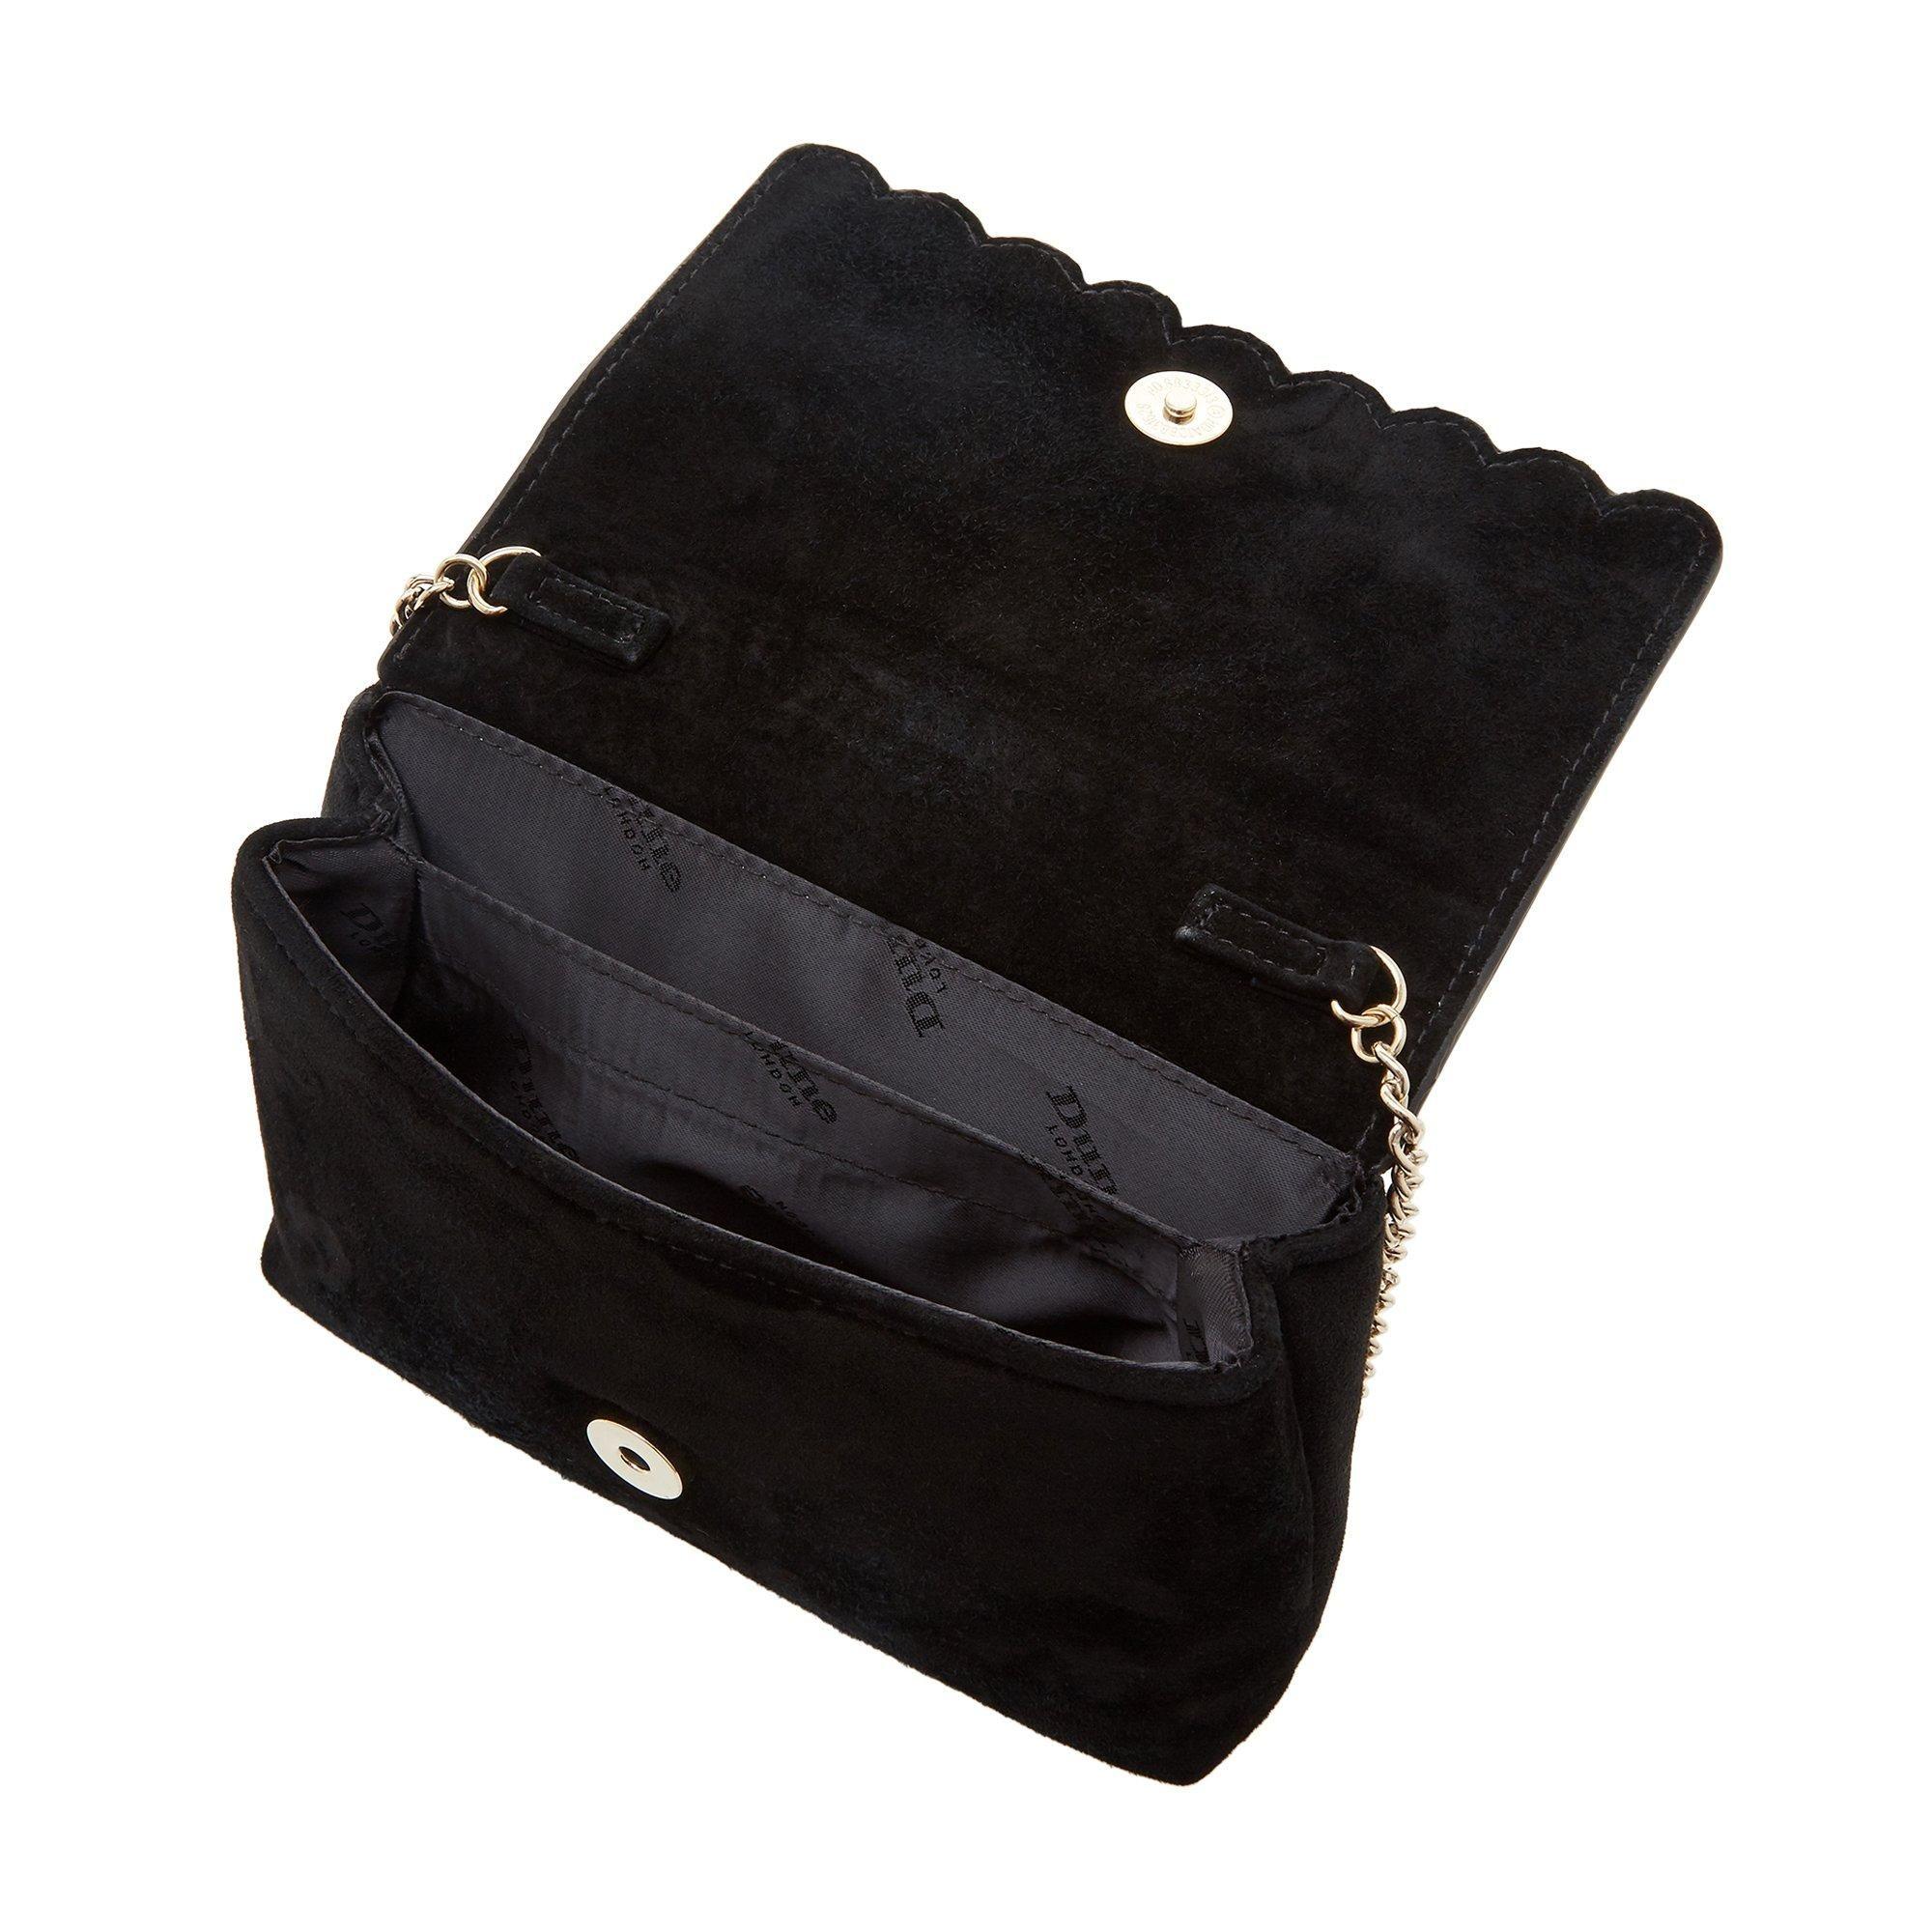 Dune BEAA Studded Cross Body Bag